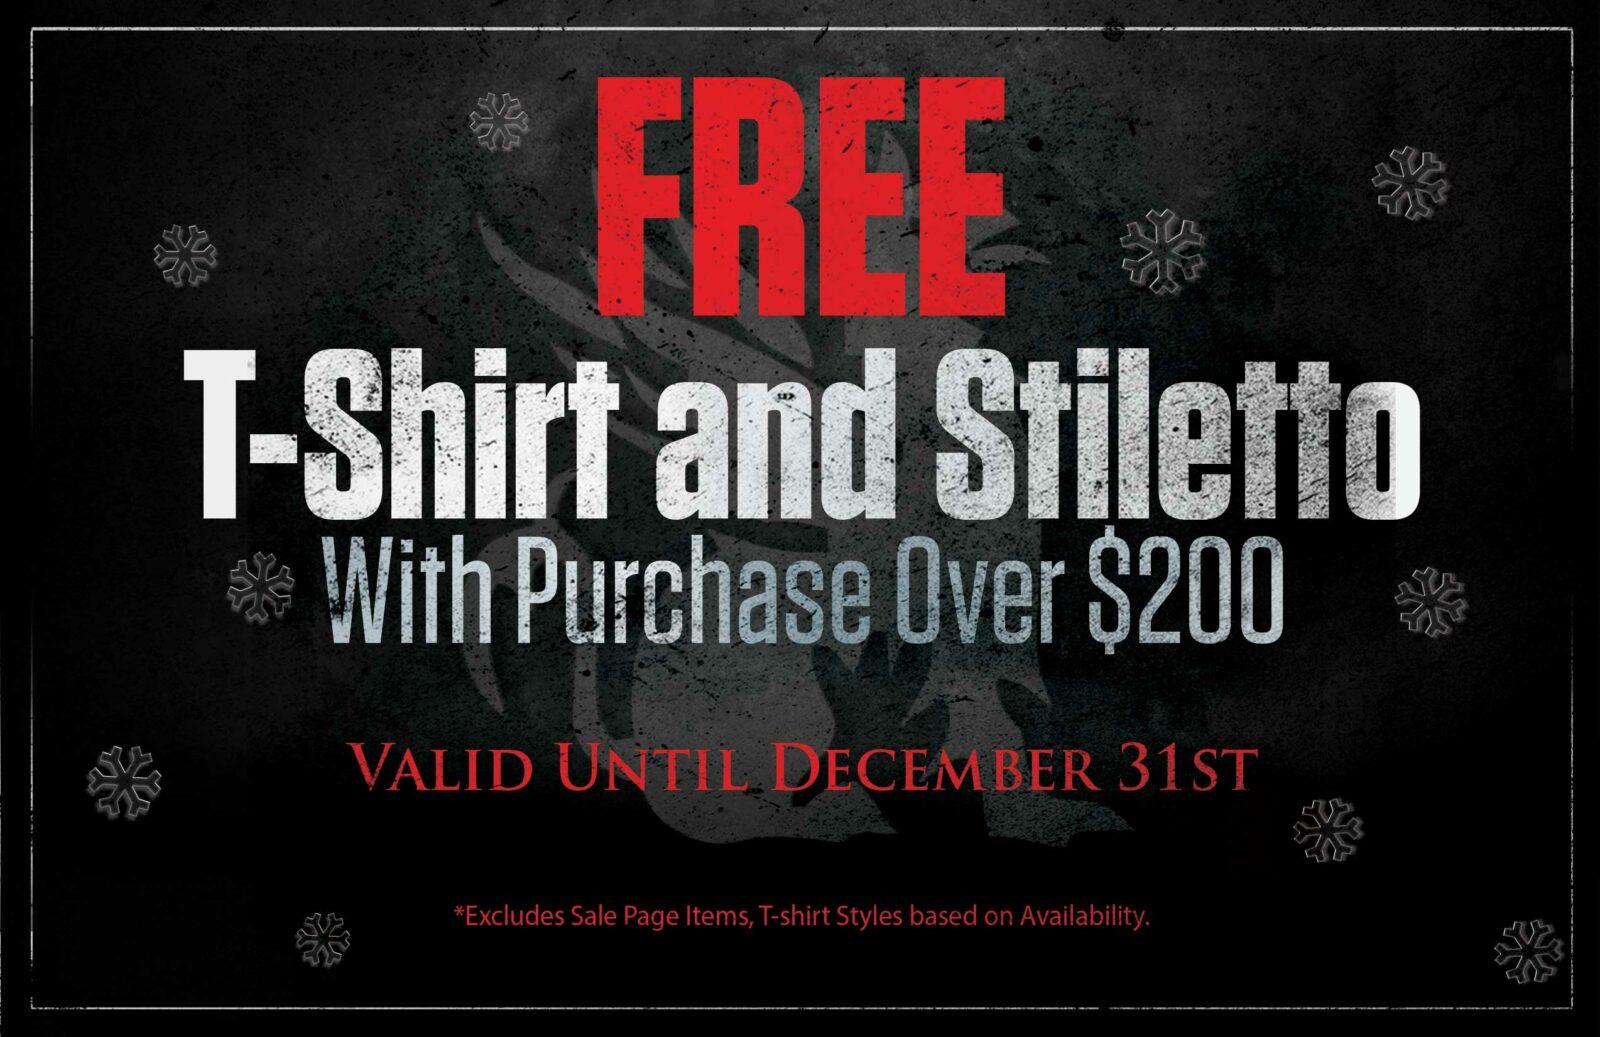 free-tshirt-stiletto-promo